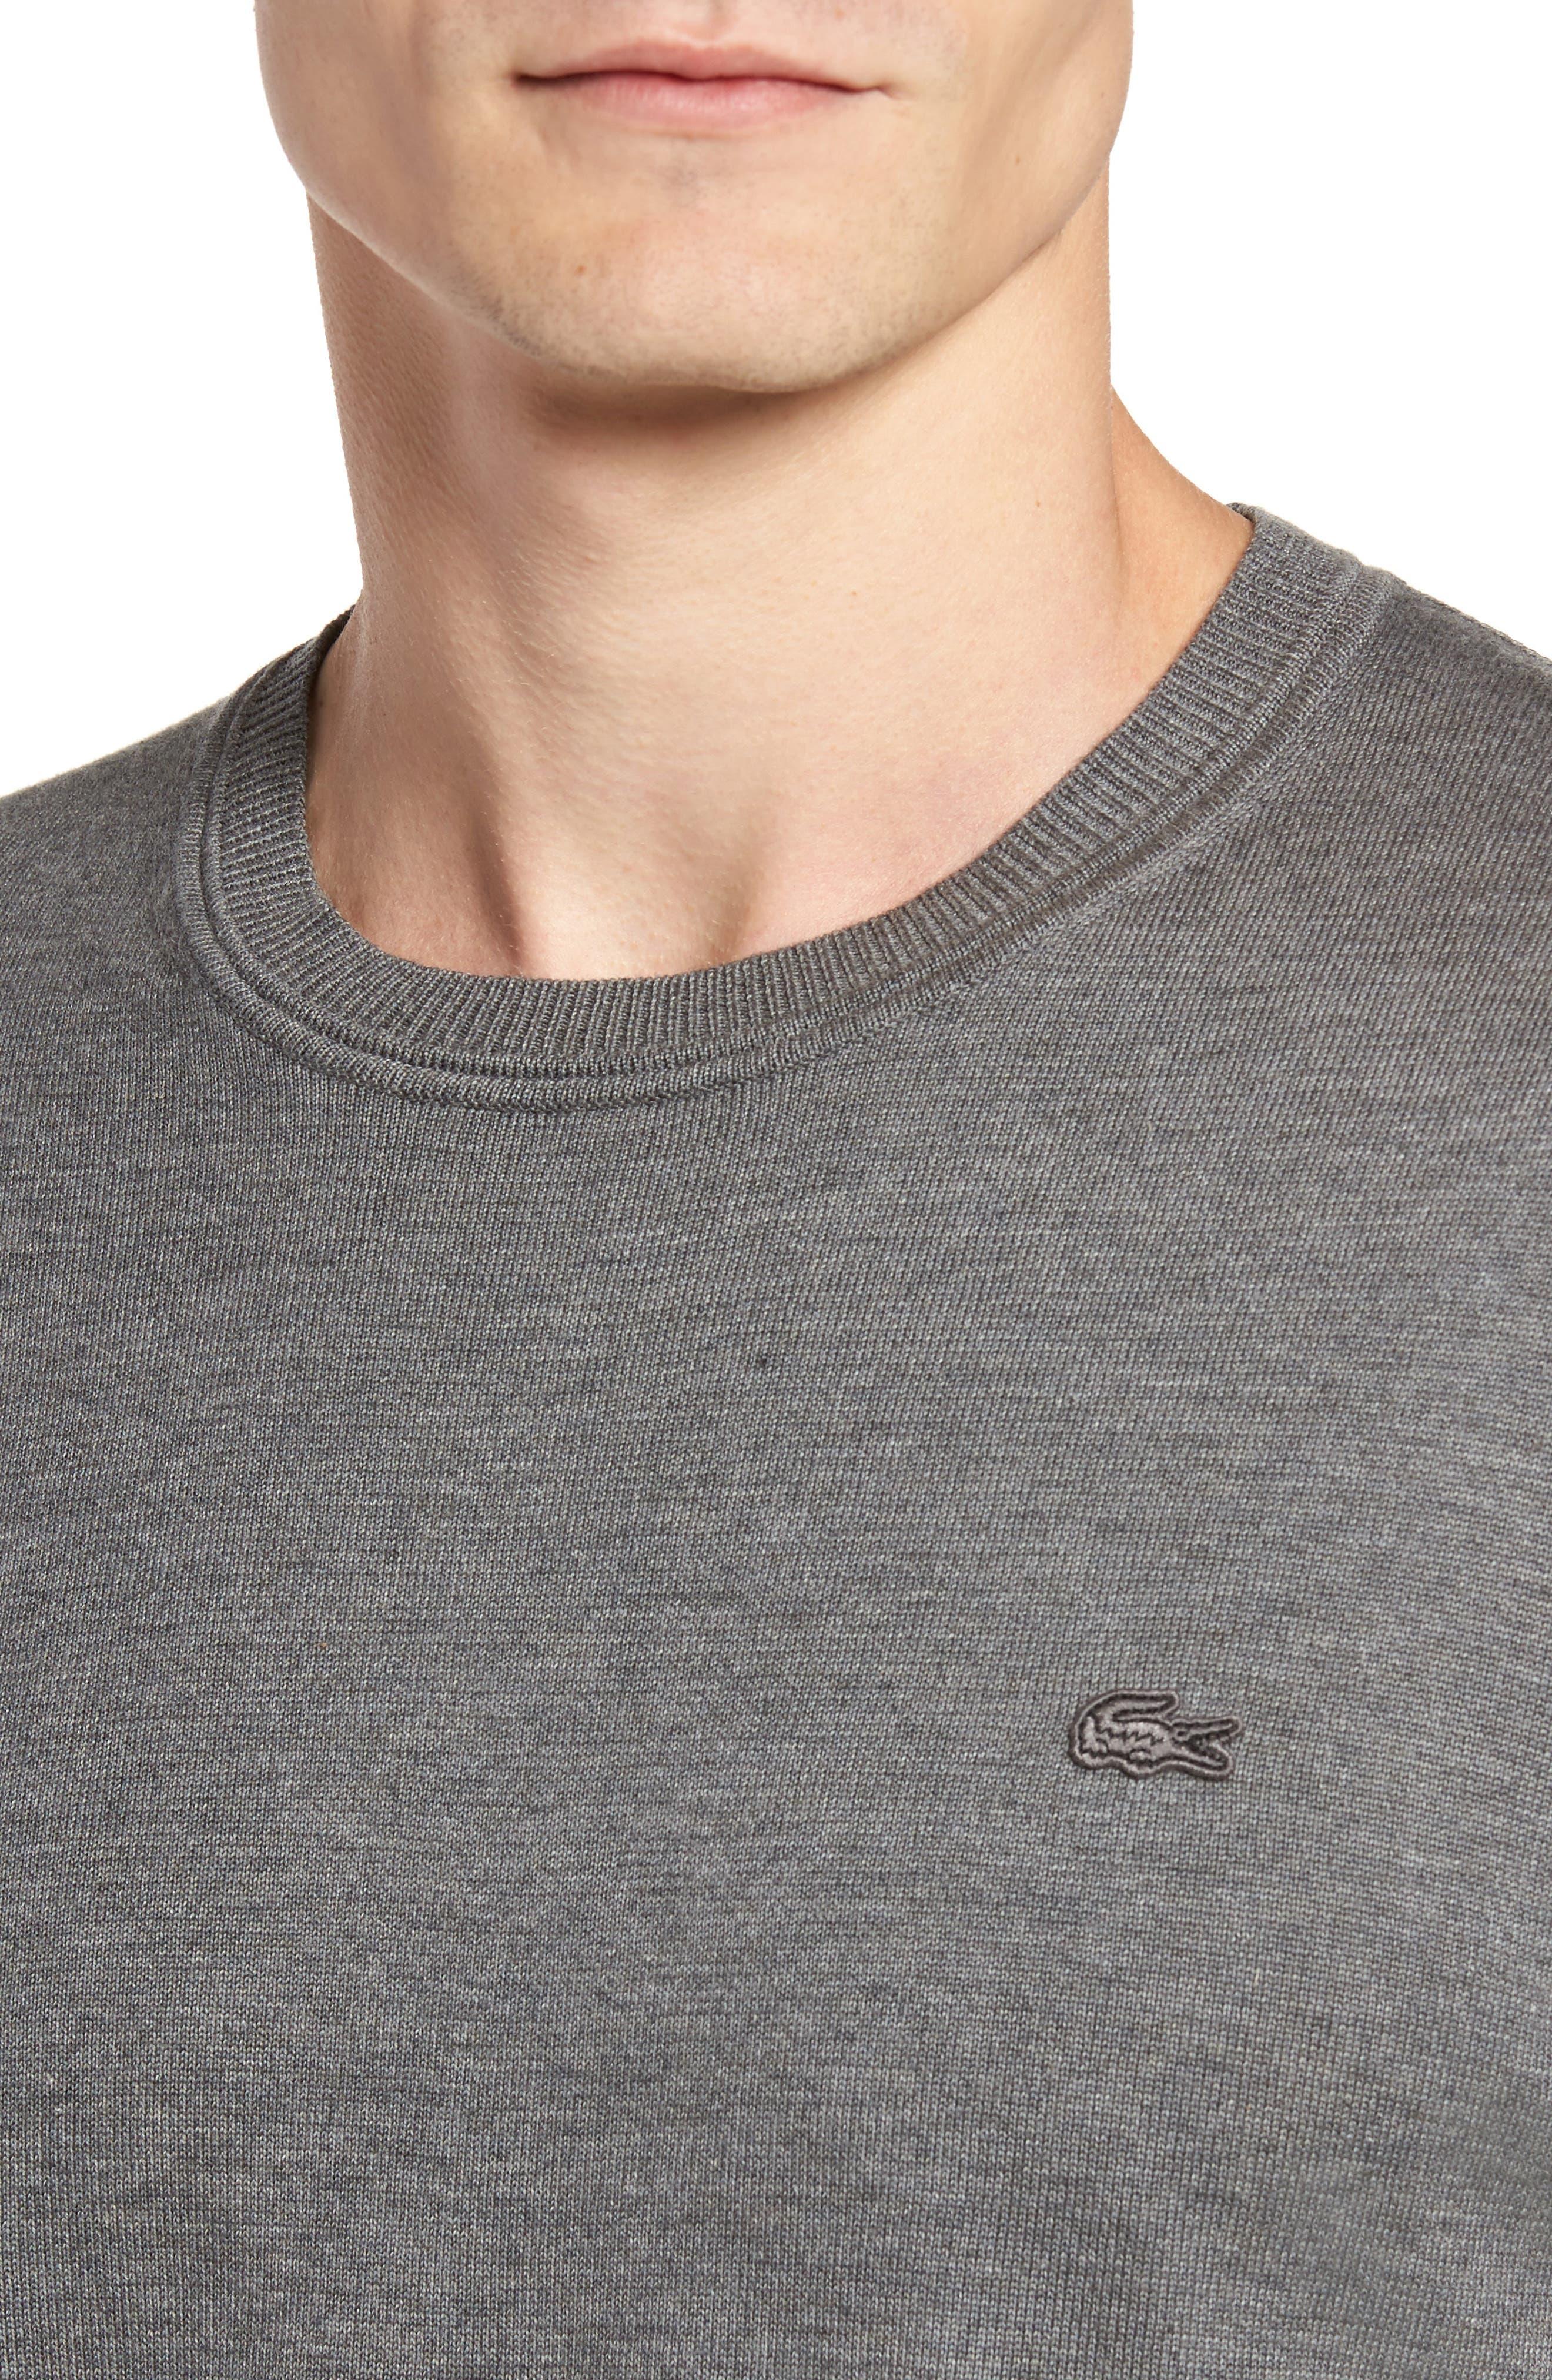 Jersey Knit Crewneck Sweater,                             Alternate thumbnail 4, color,                             032